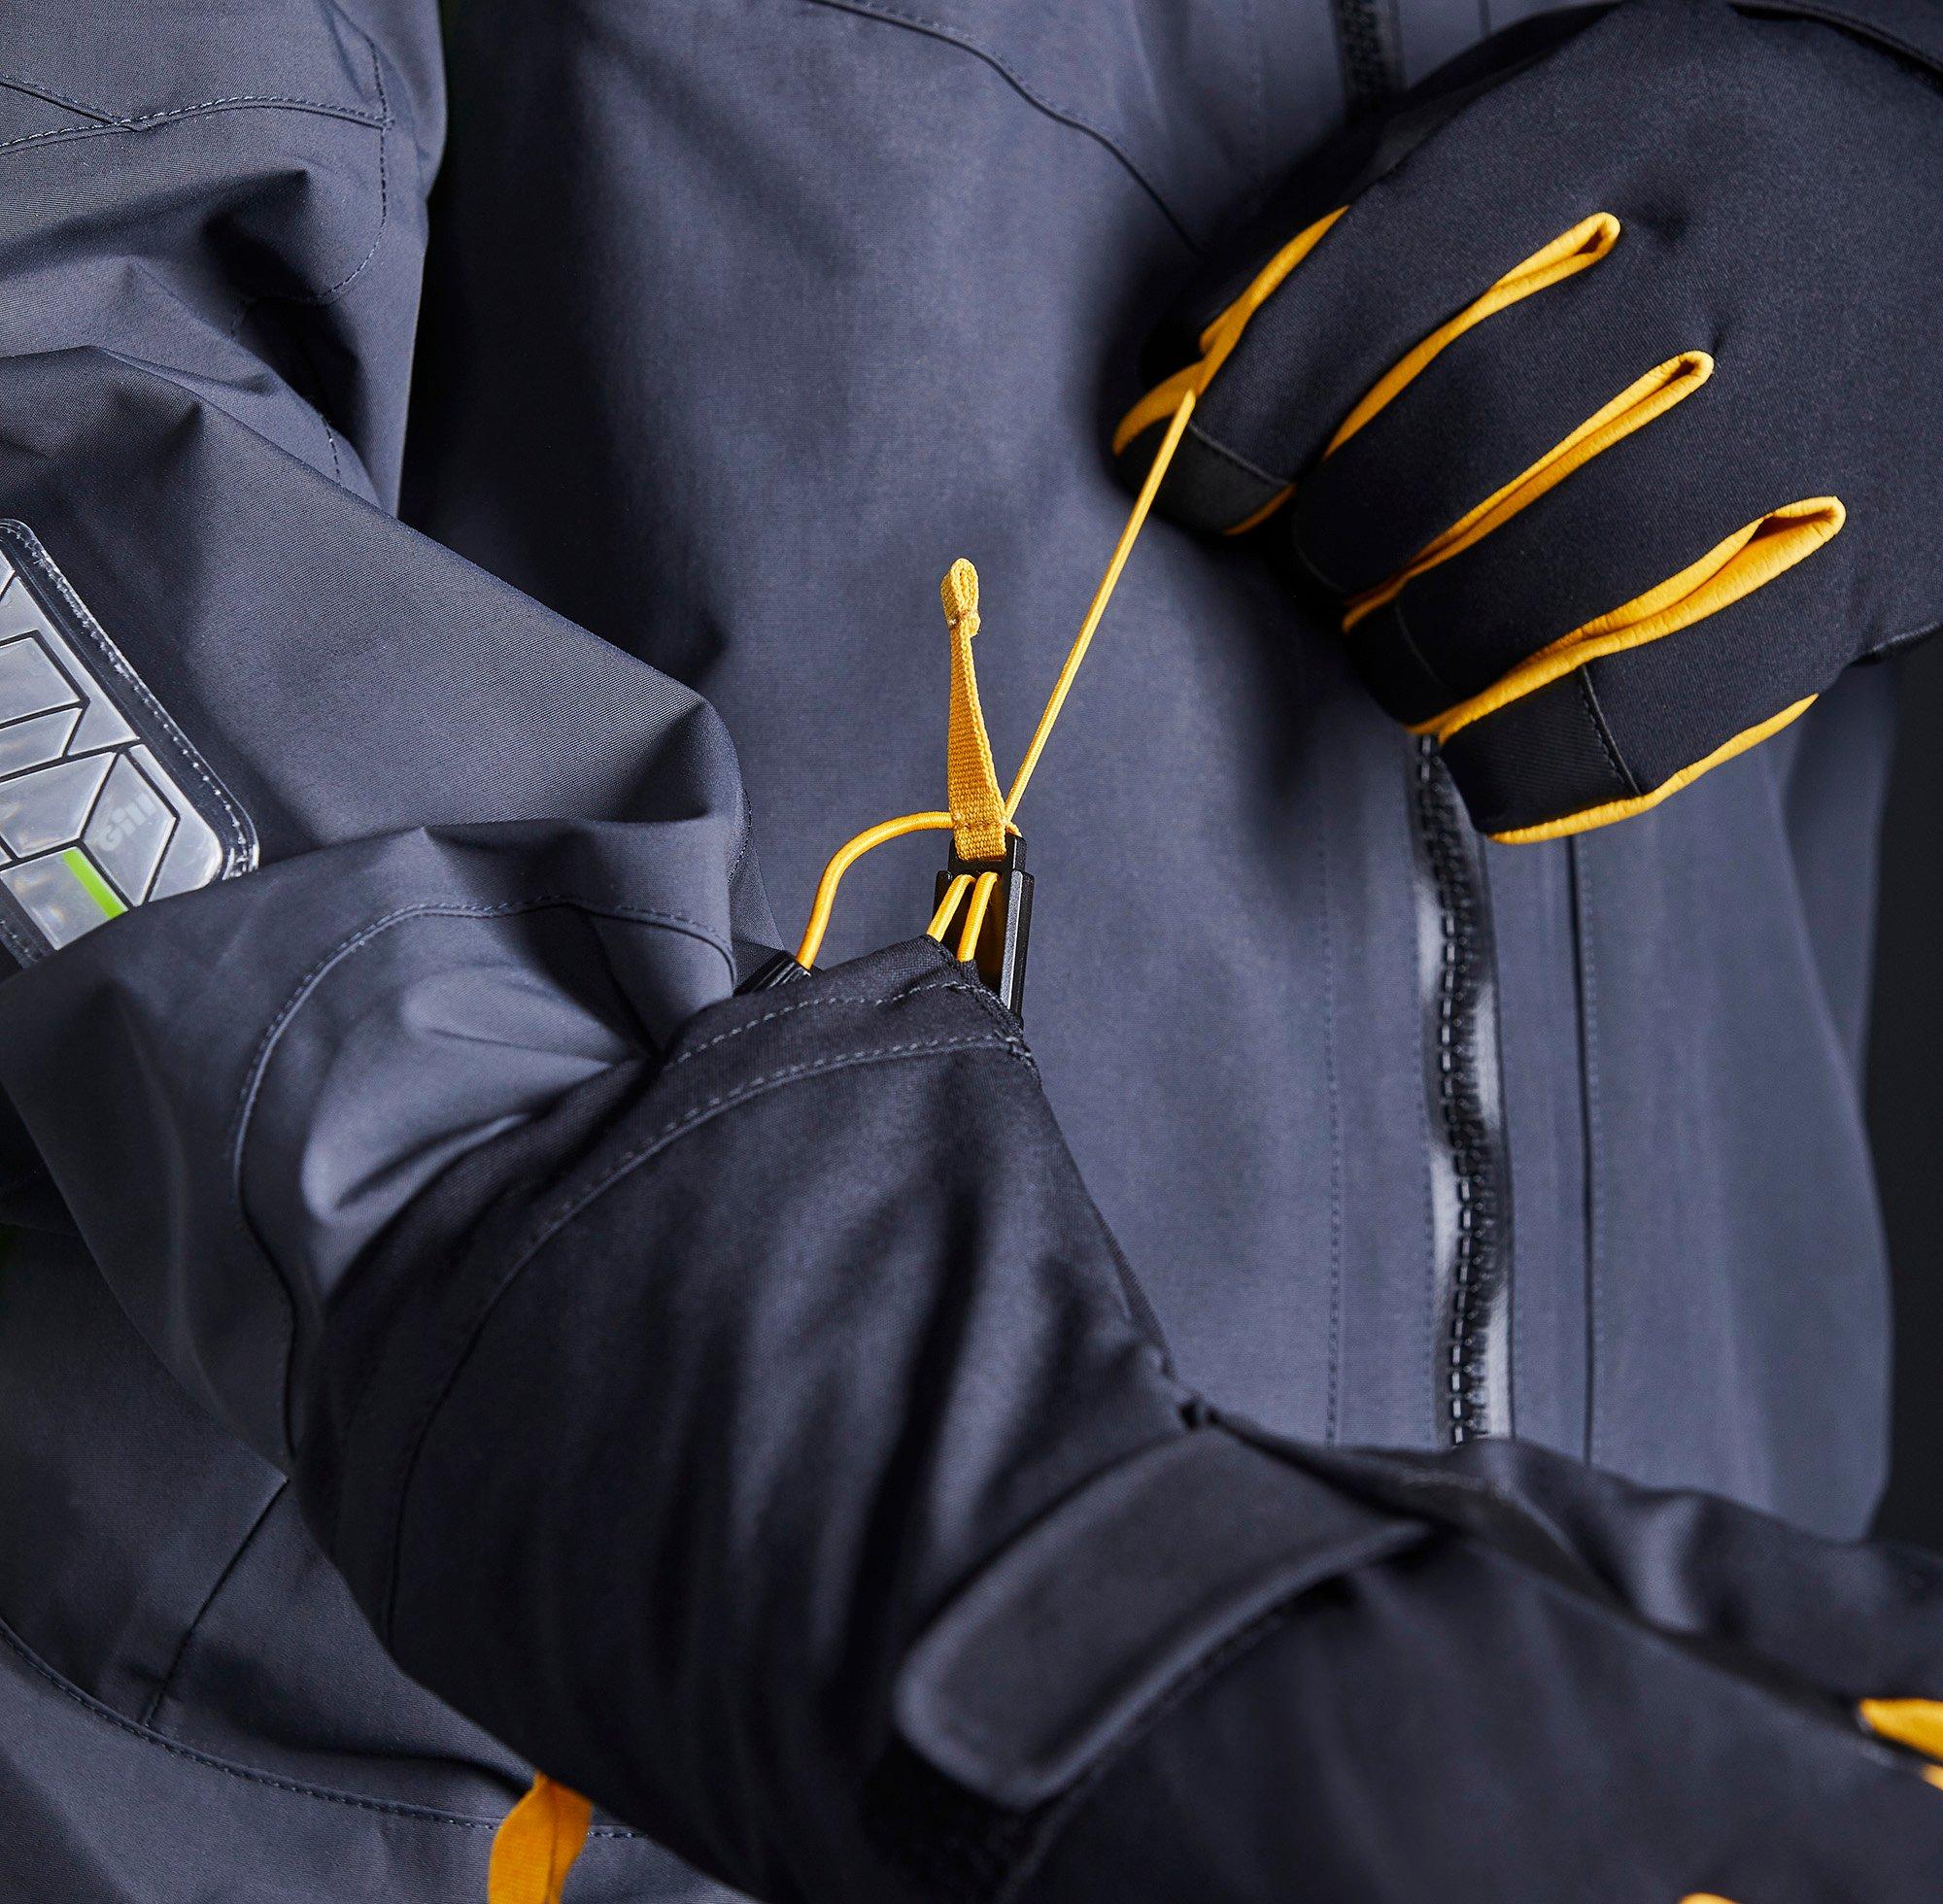 Helmsman-Handschuhe - 7805-BLK01-MODEL_5.jpg